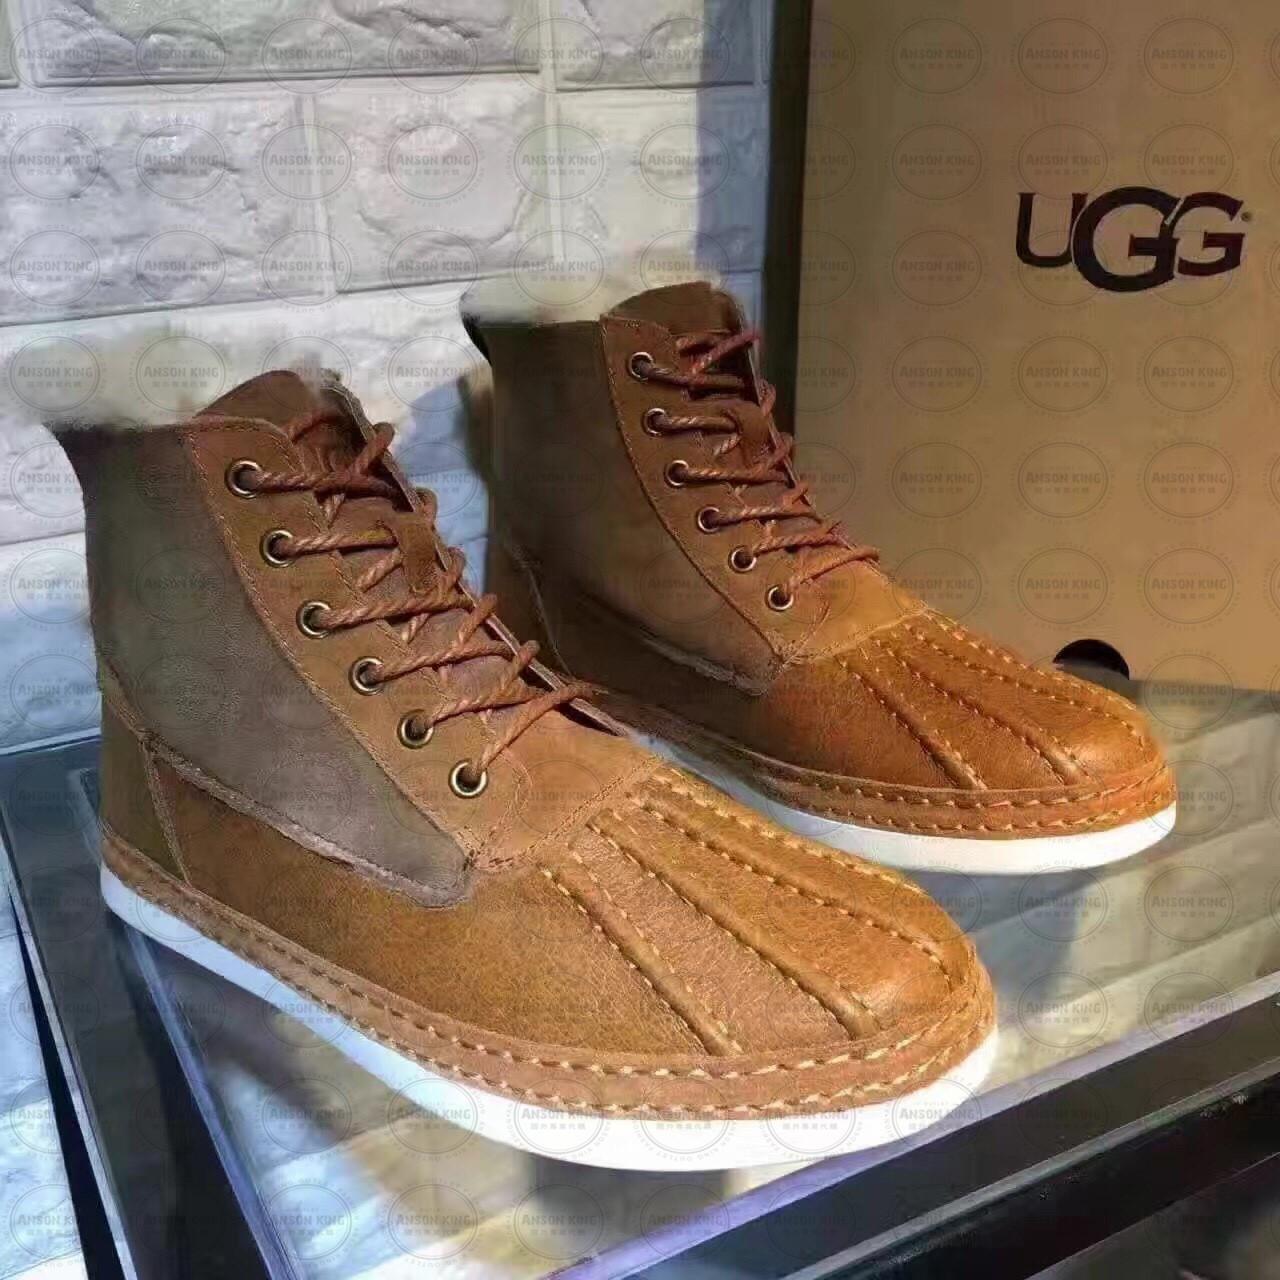 OUTLET正品代購 澳洲 UGG 冬季男款貝殼頭馬丁靴 短靴 保暖 真皮羊皮毛 雪靴 短靴 栗色